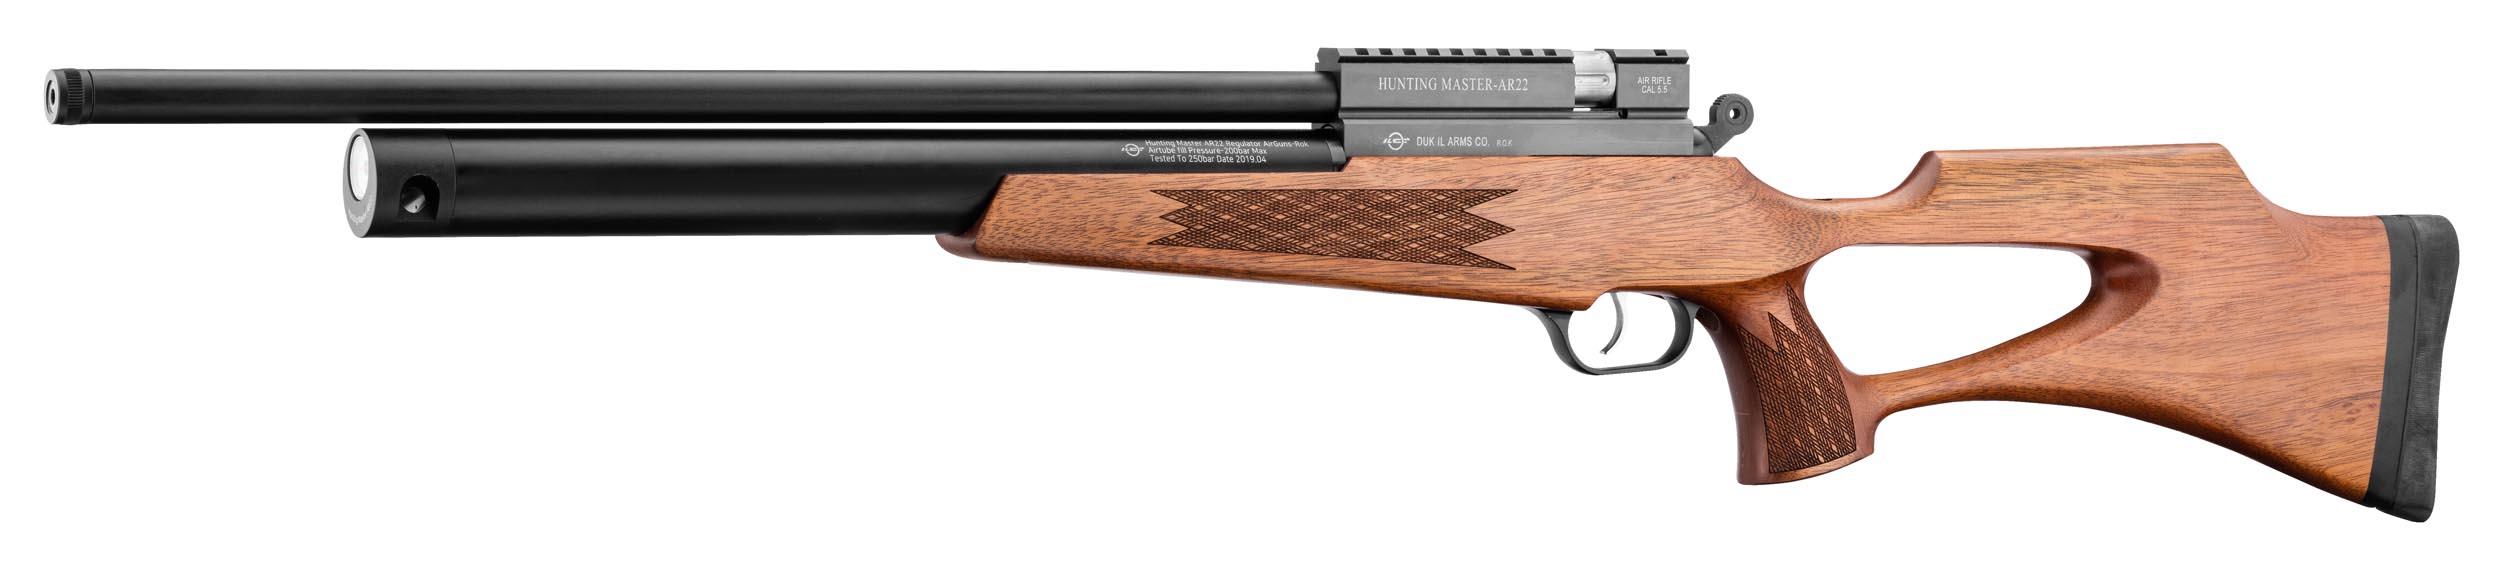 Evanix PCP AR22 Wood 5.5 mm  RESERVA